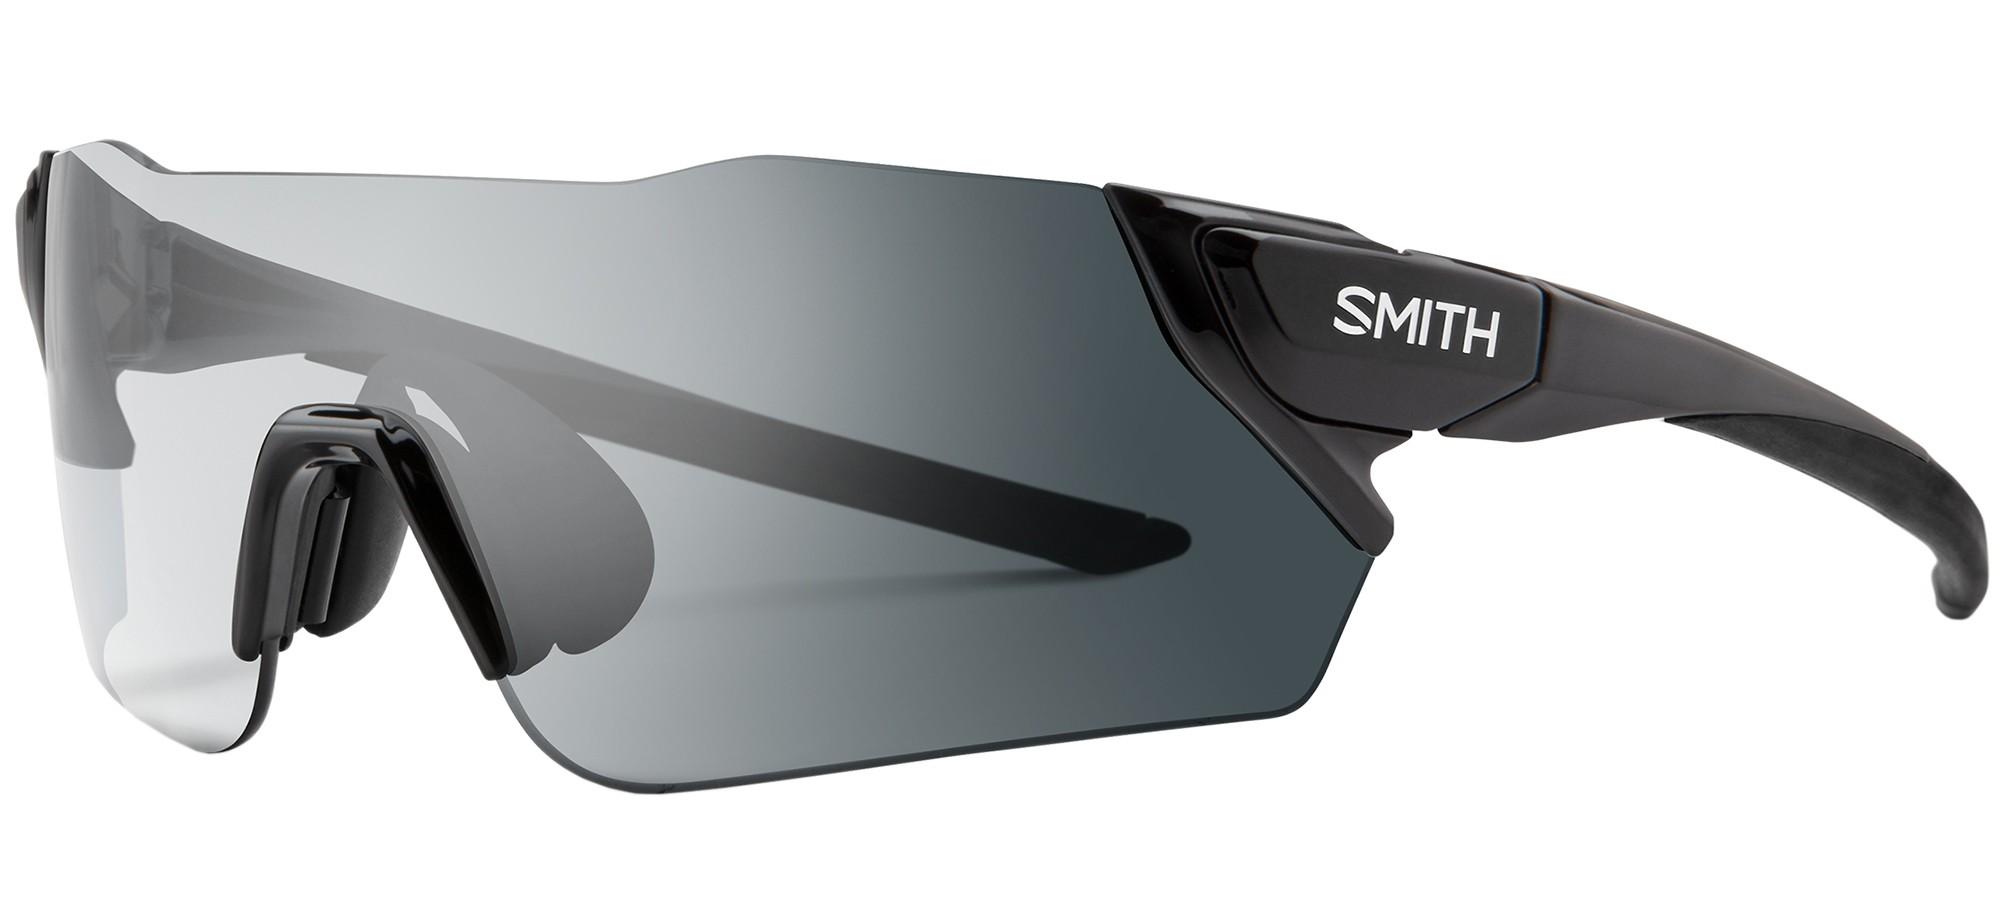 Smith Optics solbriller ATTACK